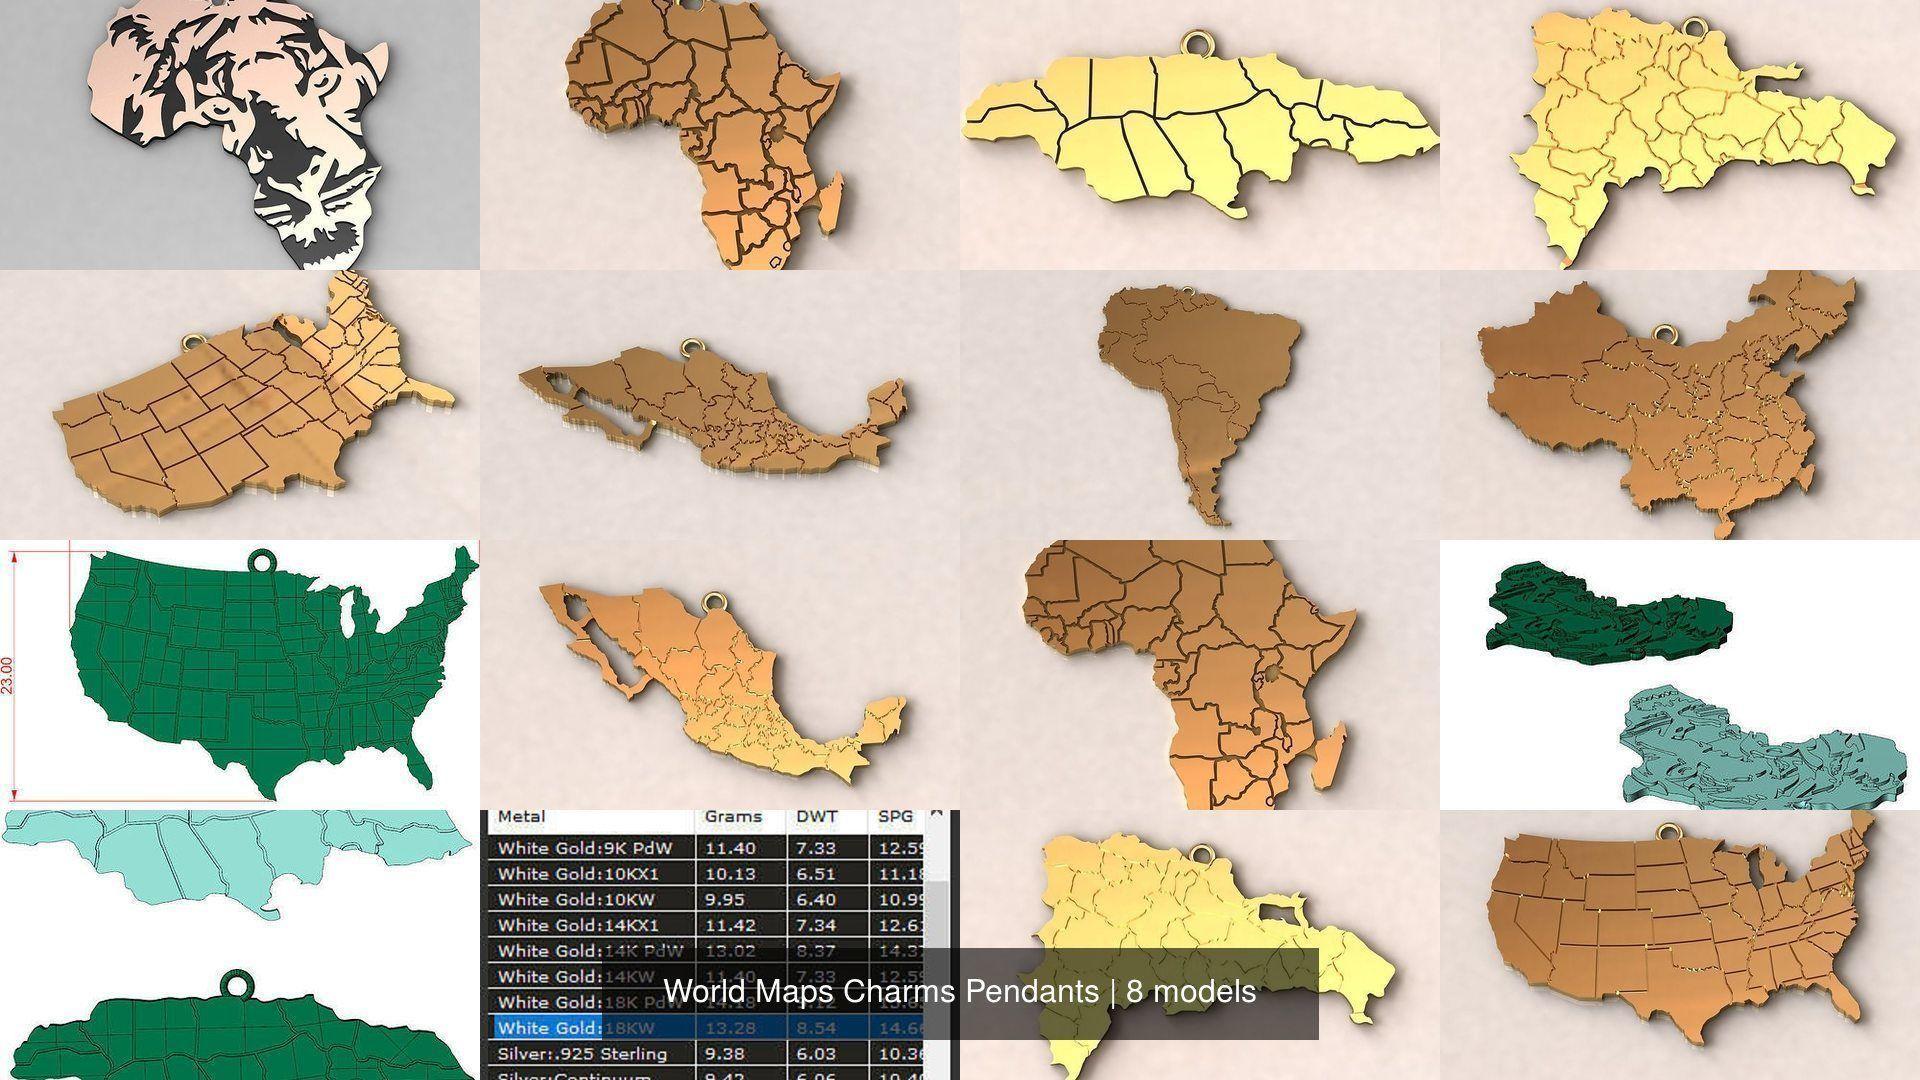 World Maps Charms Pendants